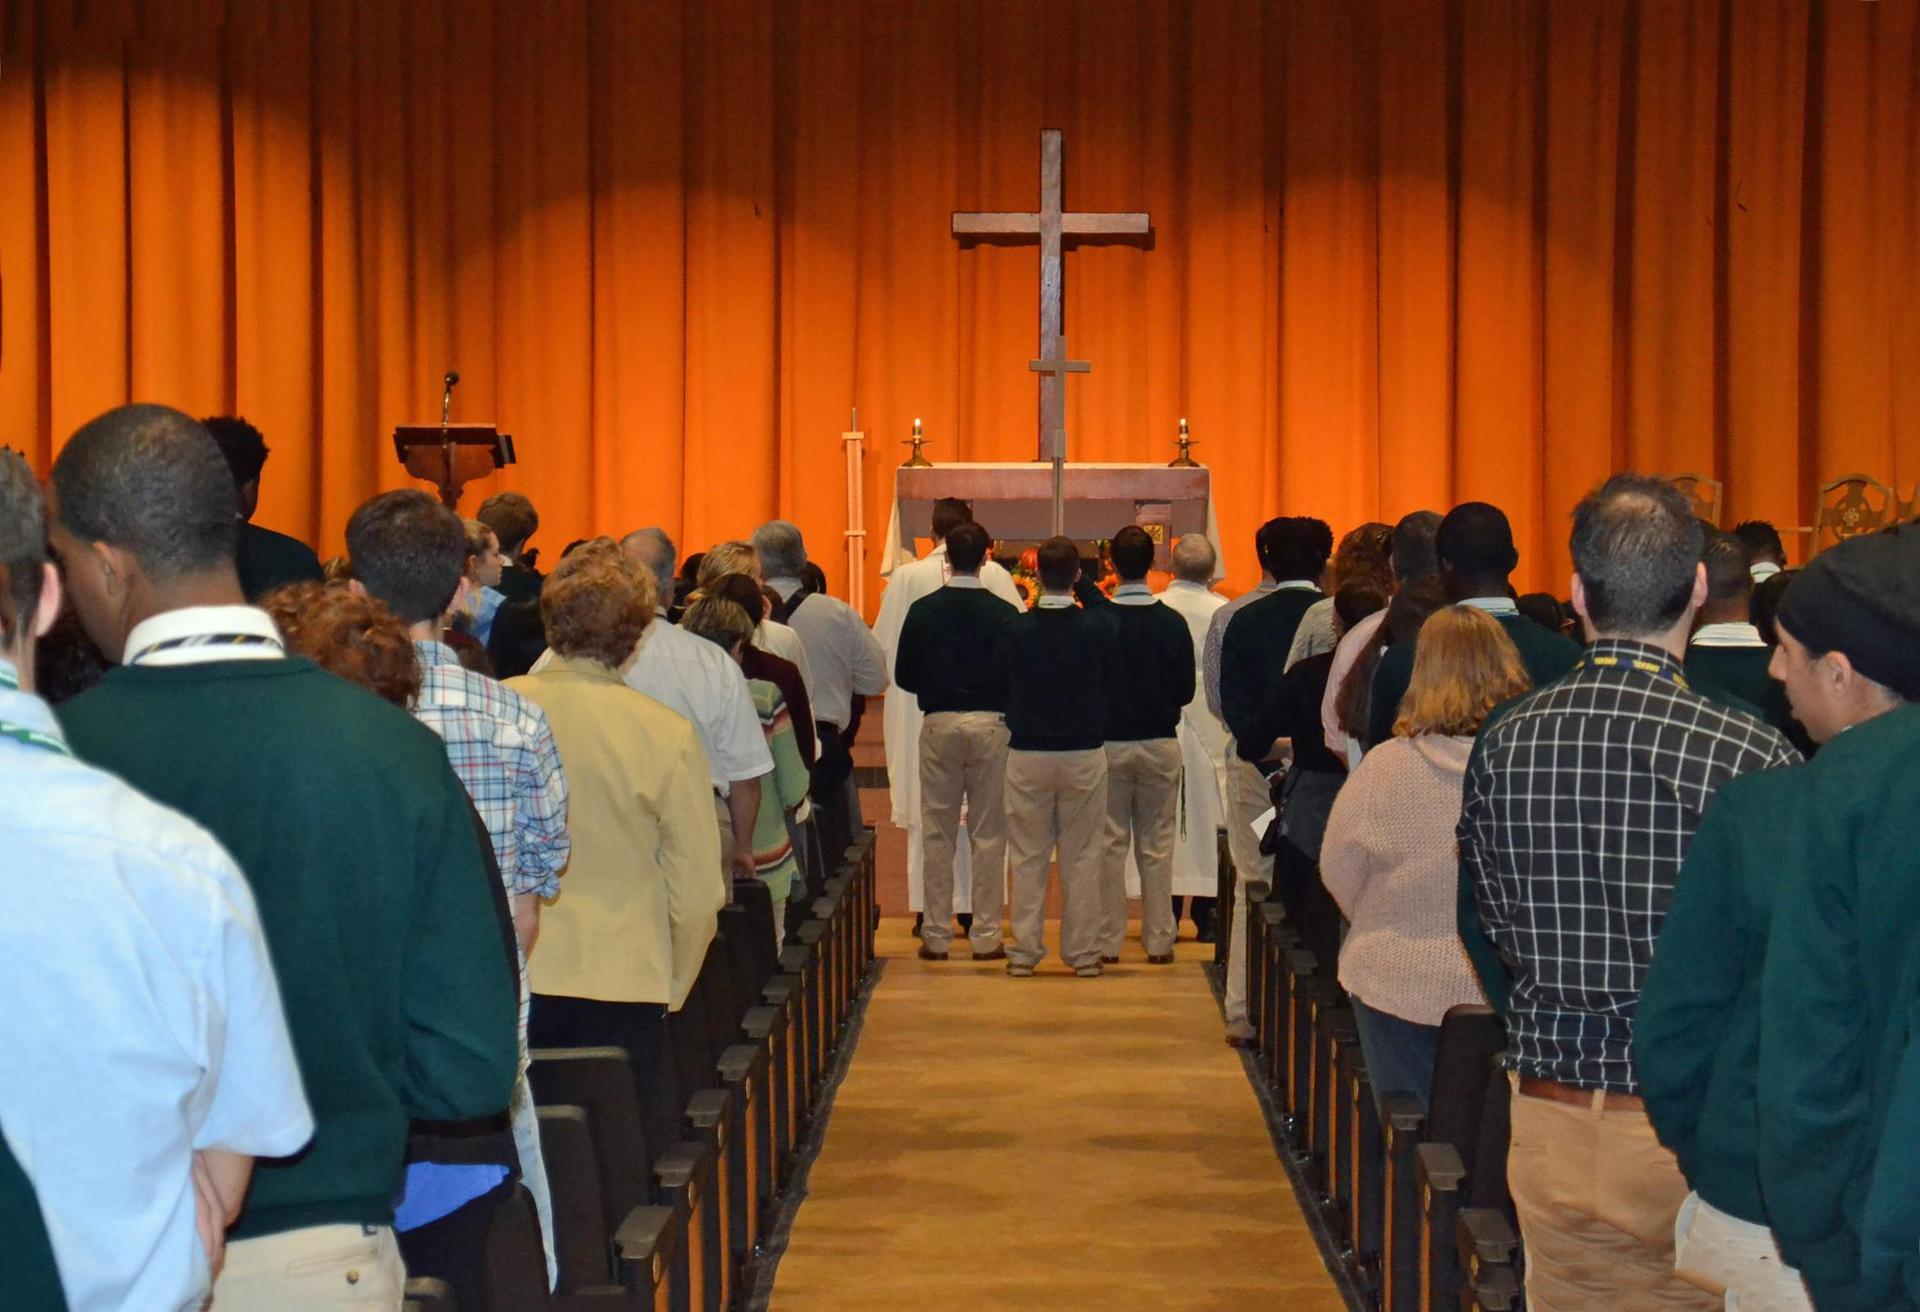 School liturgy